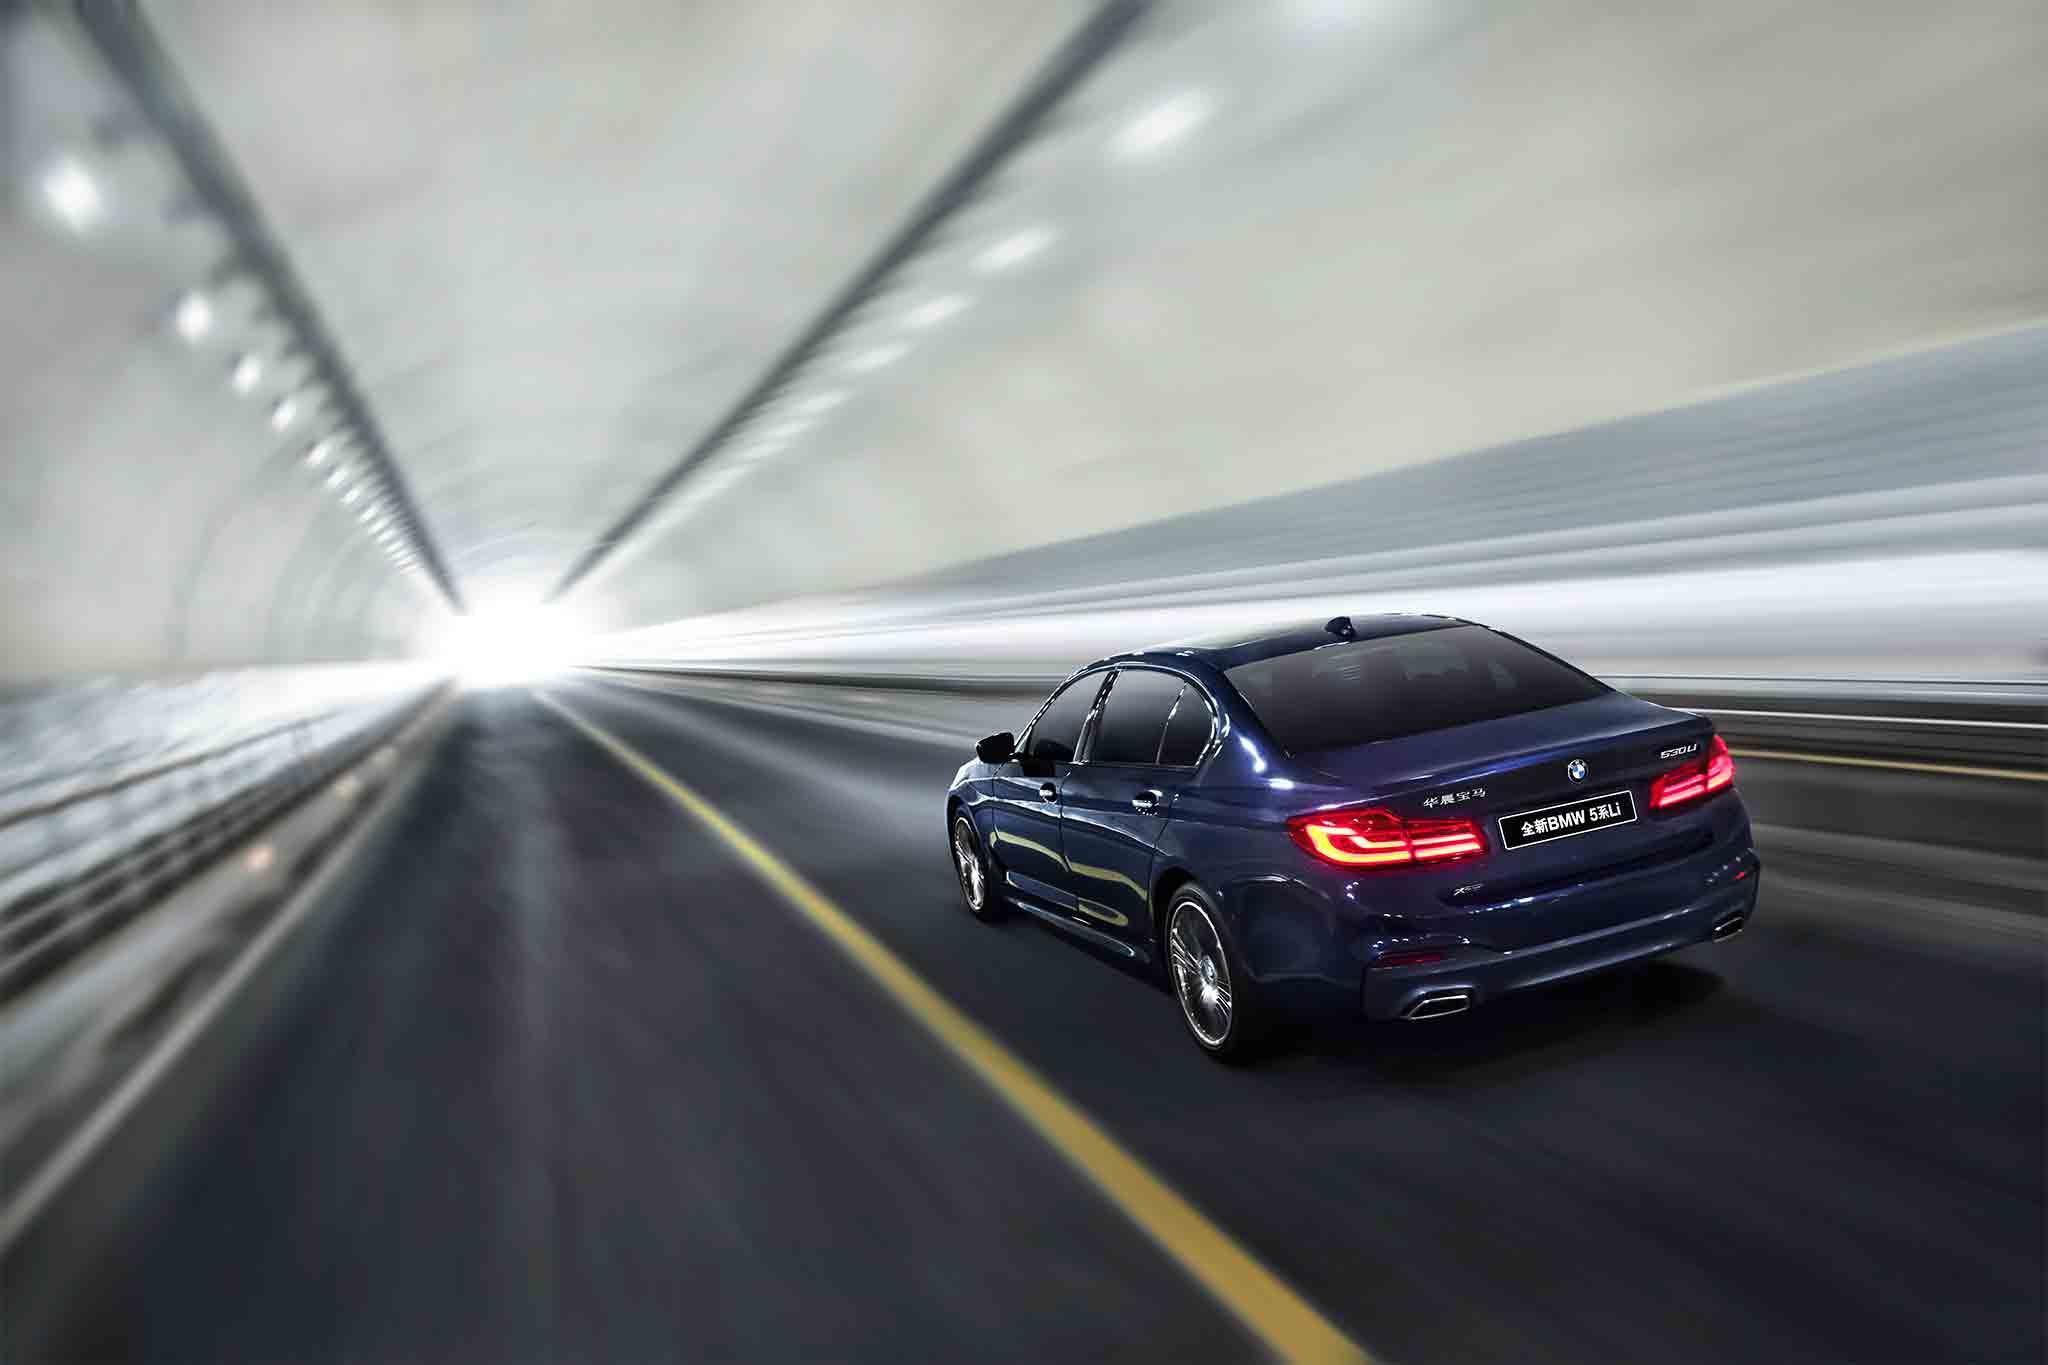 Chinese-market-BMW-5-Series-long-wheelbase-rear-three-quarter-in-motion-1